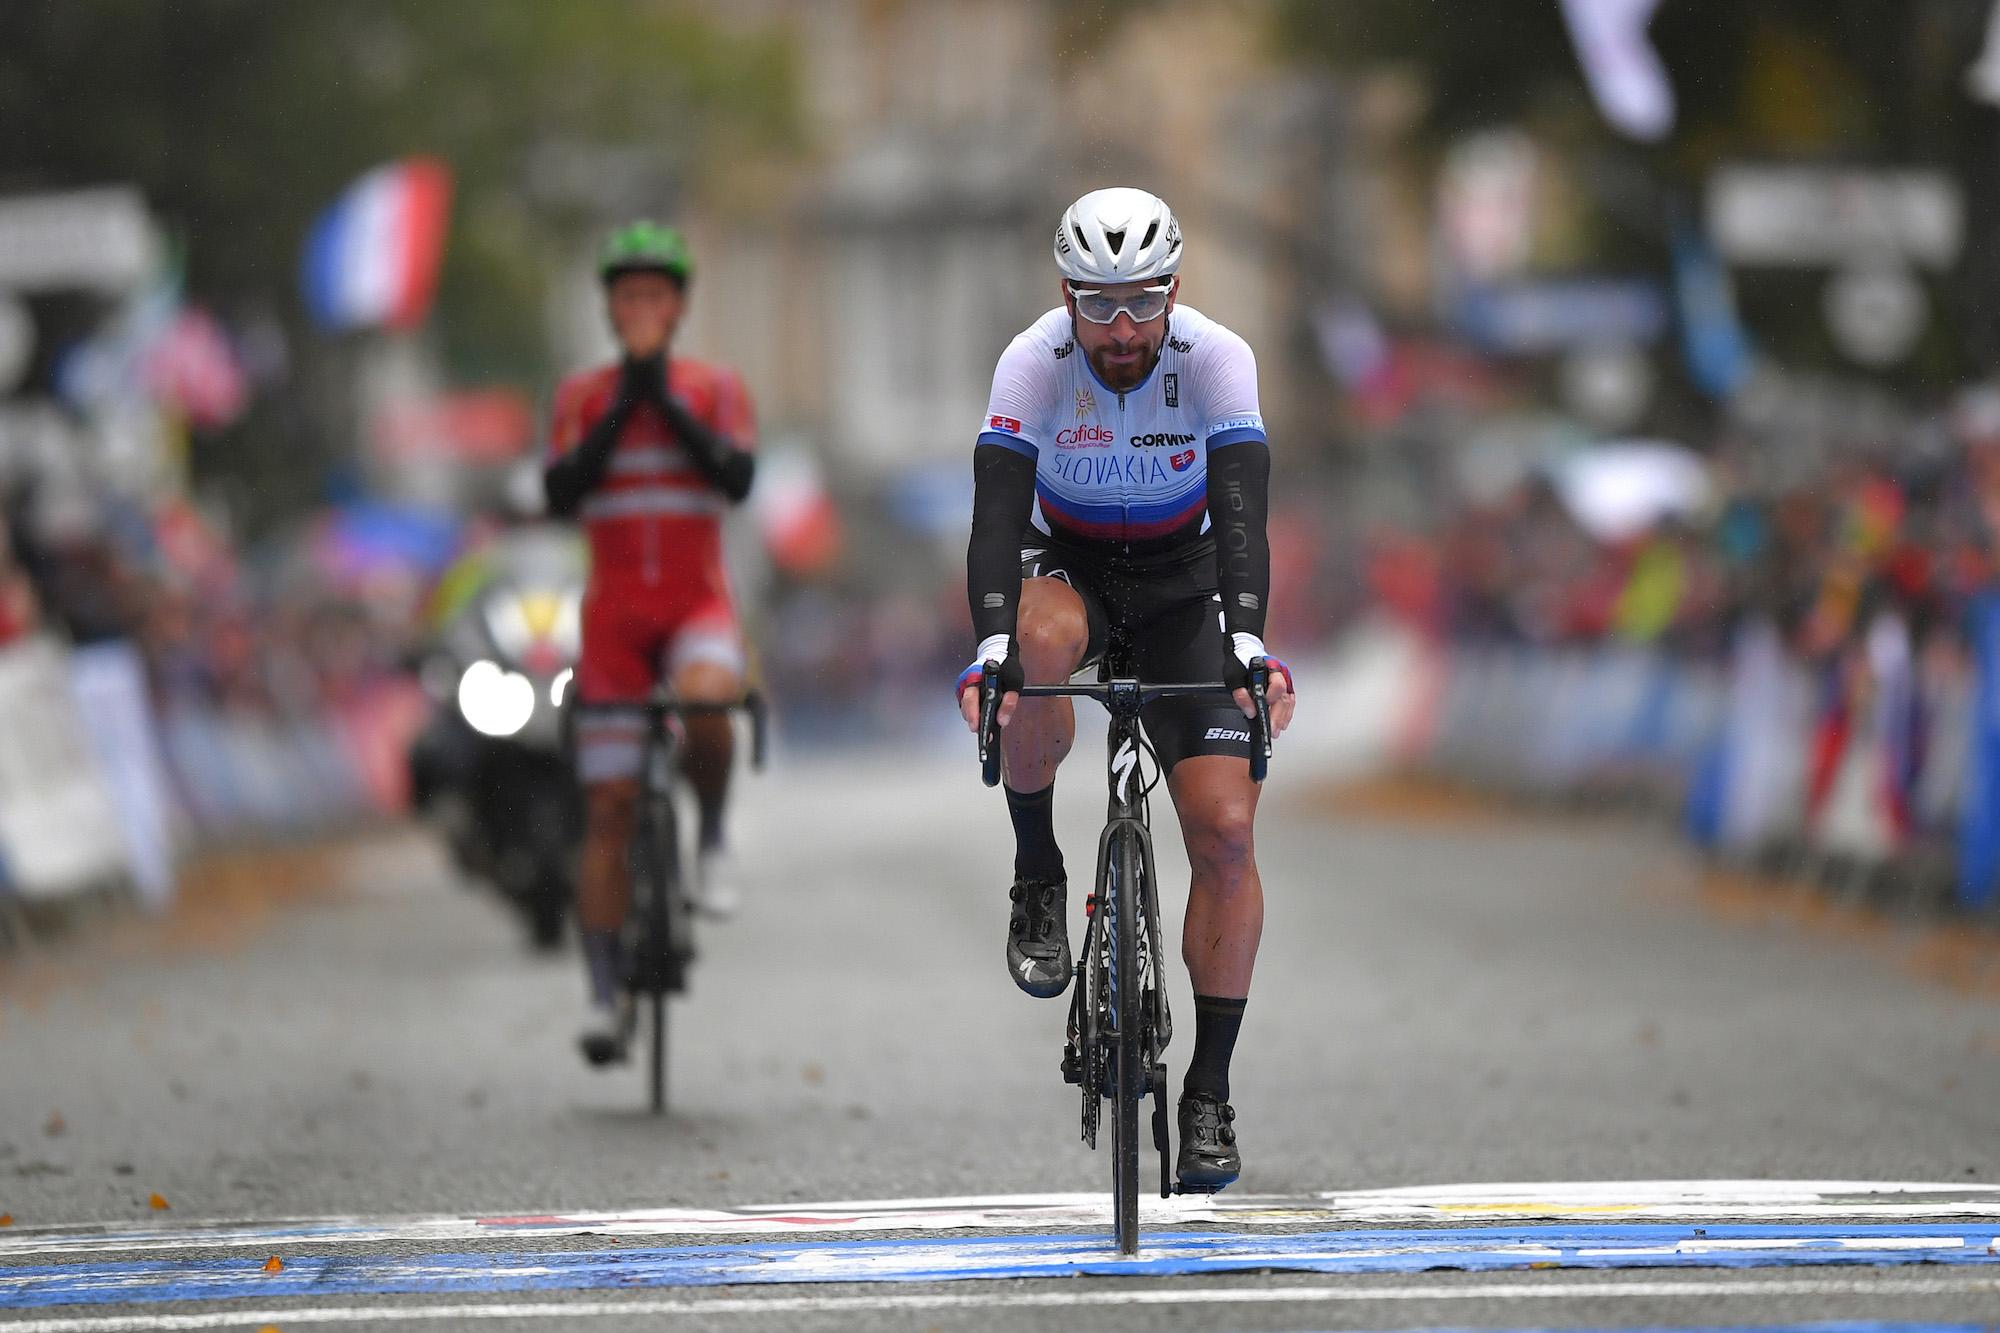 Peter Sagan won't ride mountain bike event at Tokyo 2020 Olympics